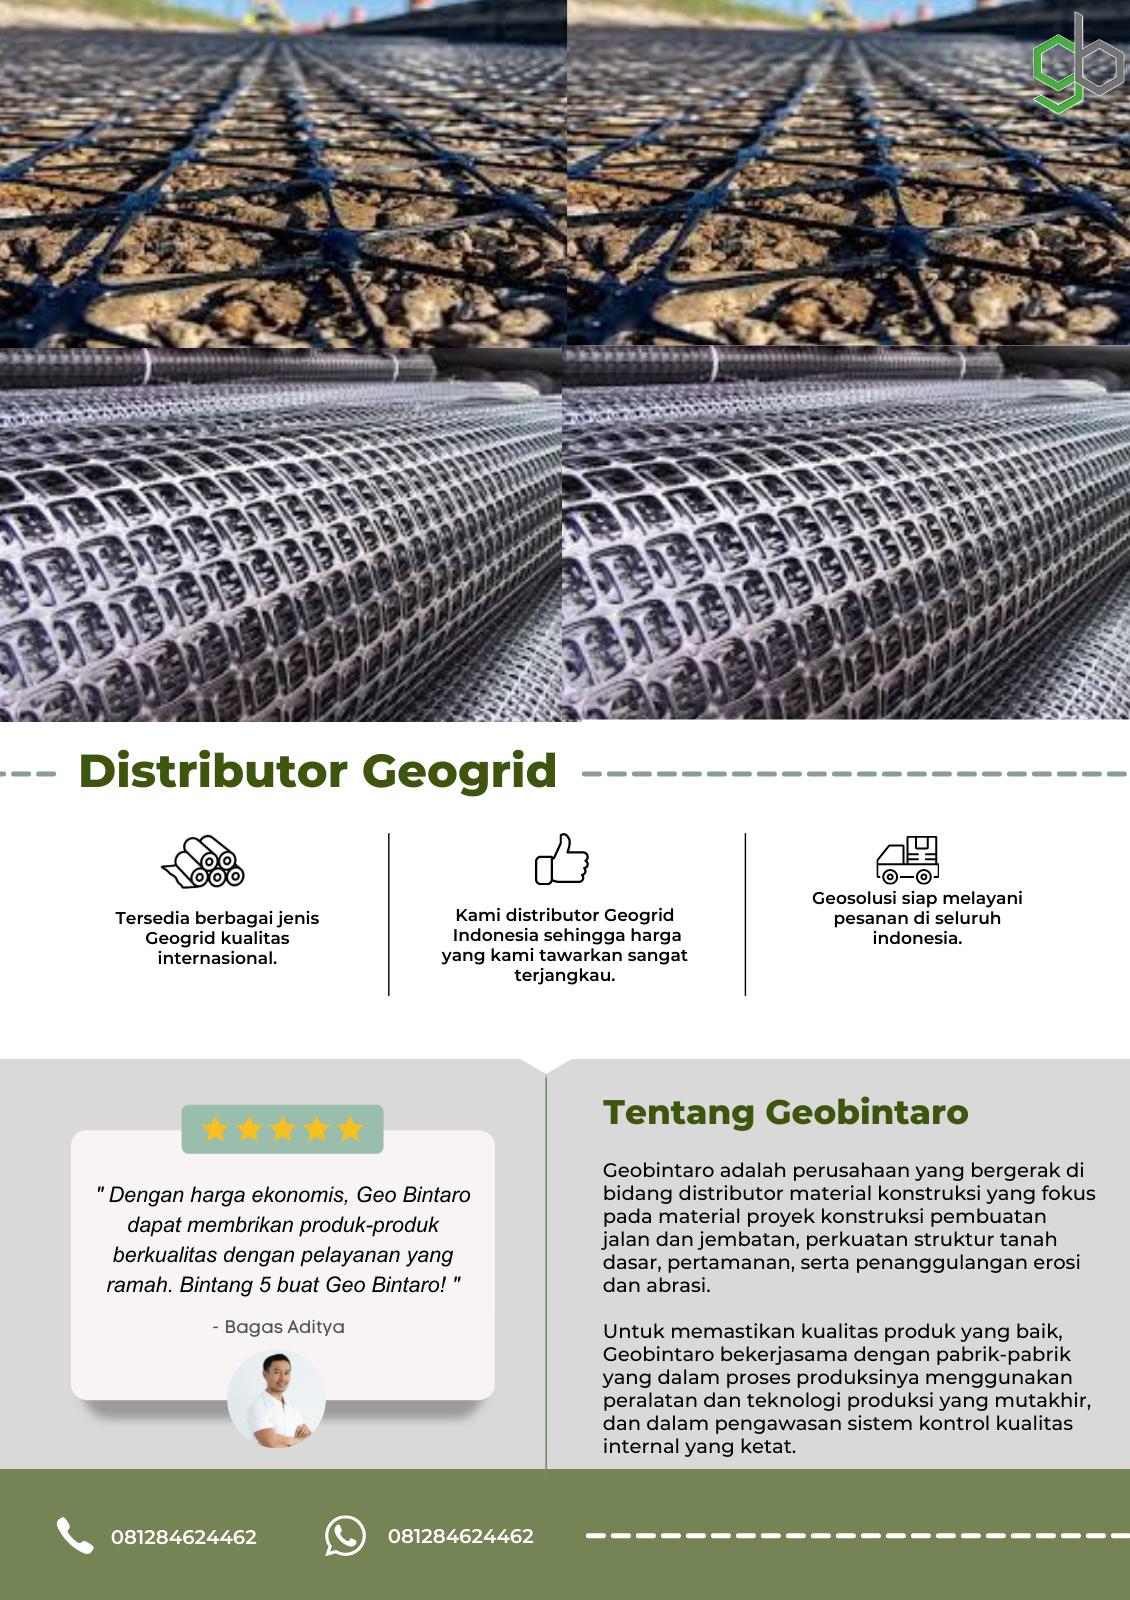 Distributor Geogrid